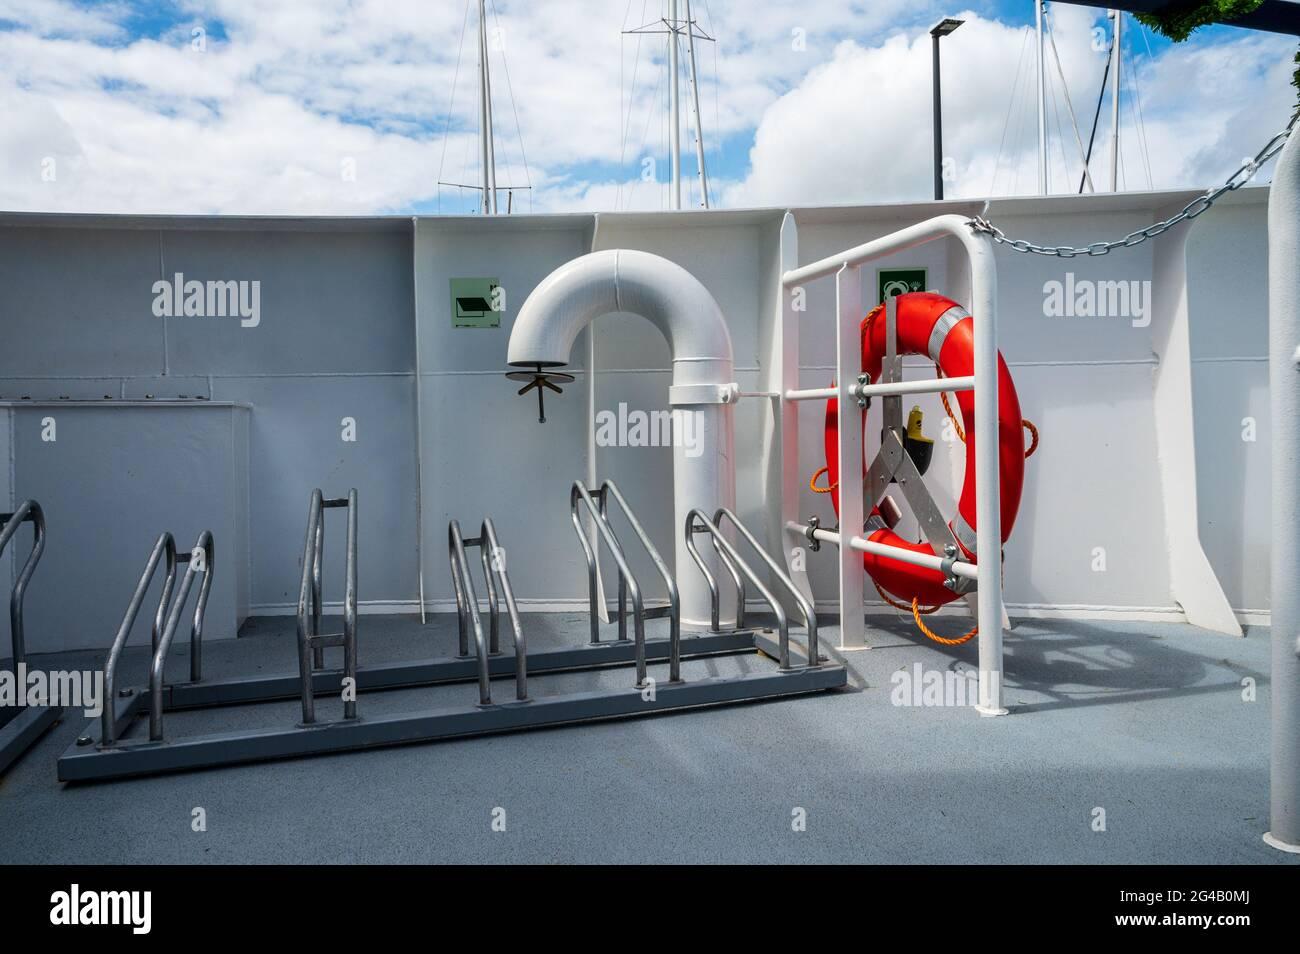 Fahrradständer und Rettungsring einer Personenfähre der Kieler Fördefährlinie in der Kieler Förde Stock Photo